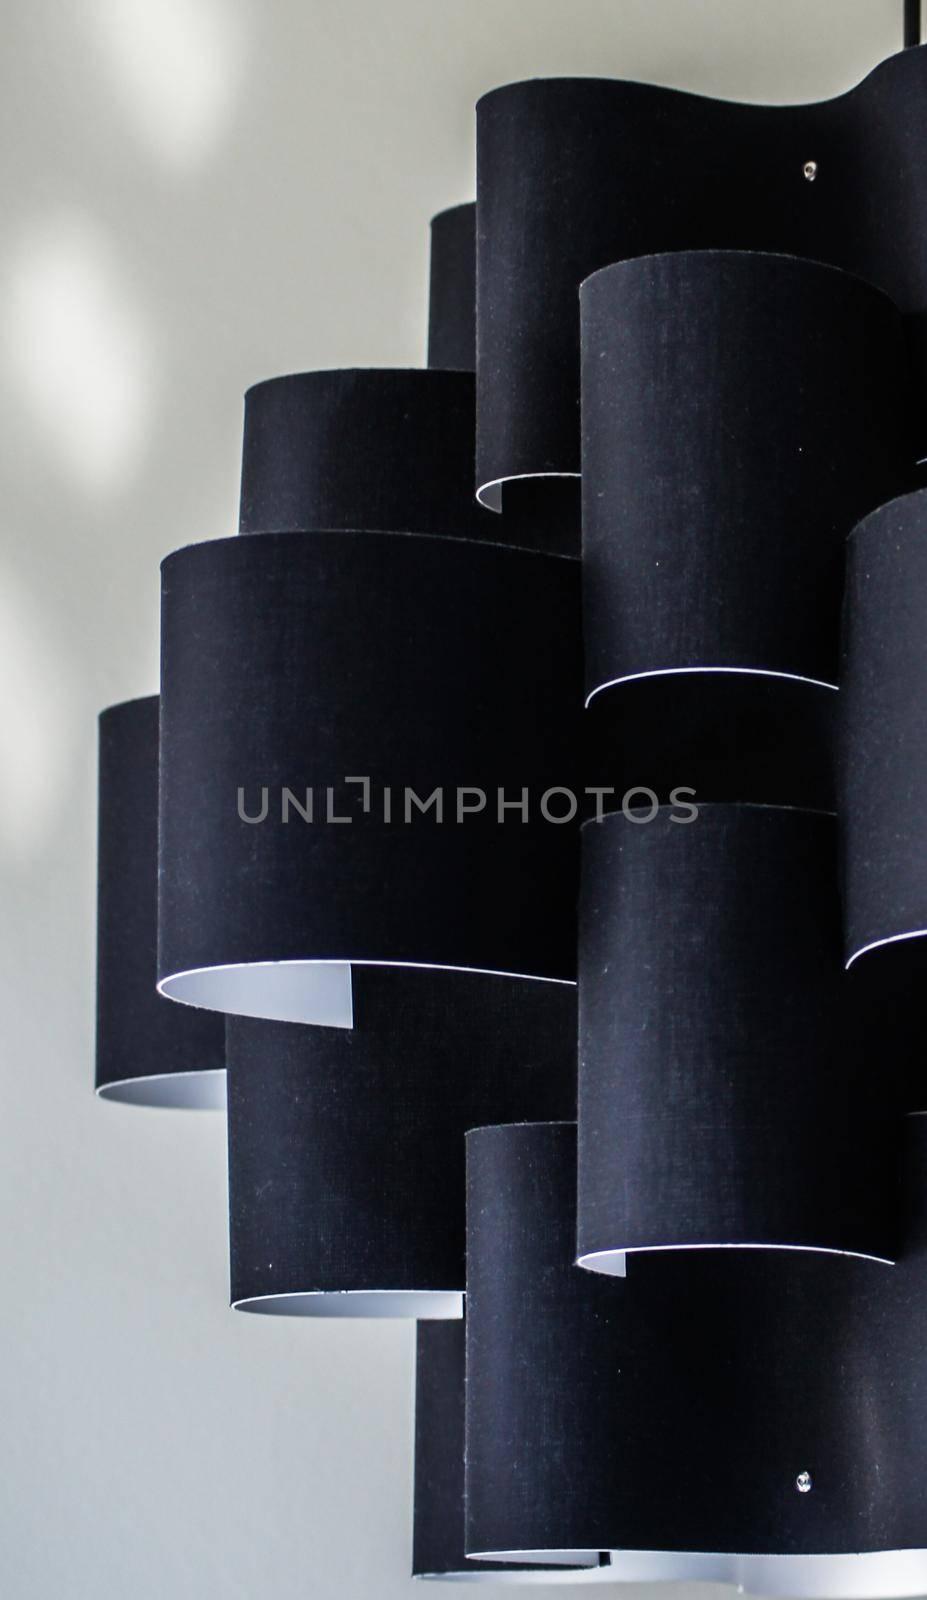 Interior decoration concept with black lighter details